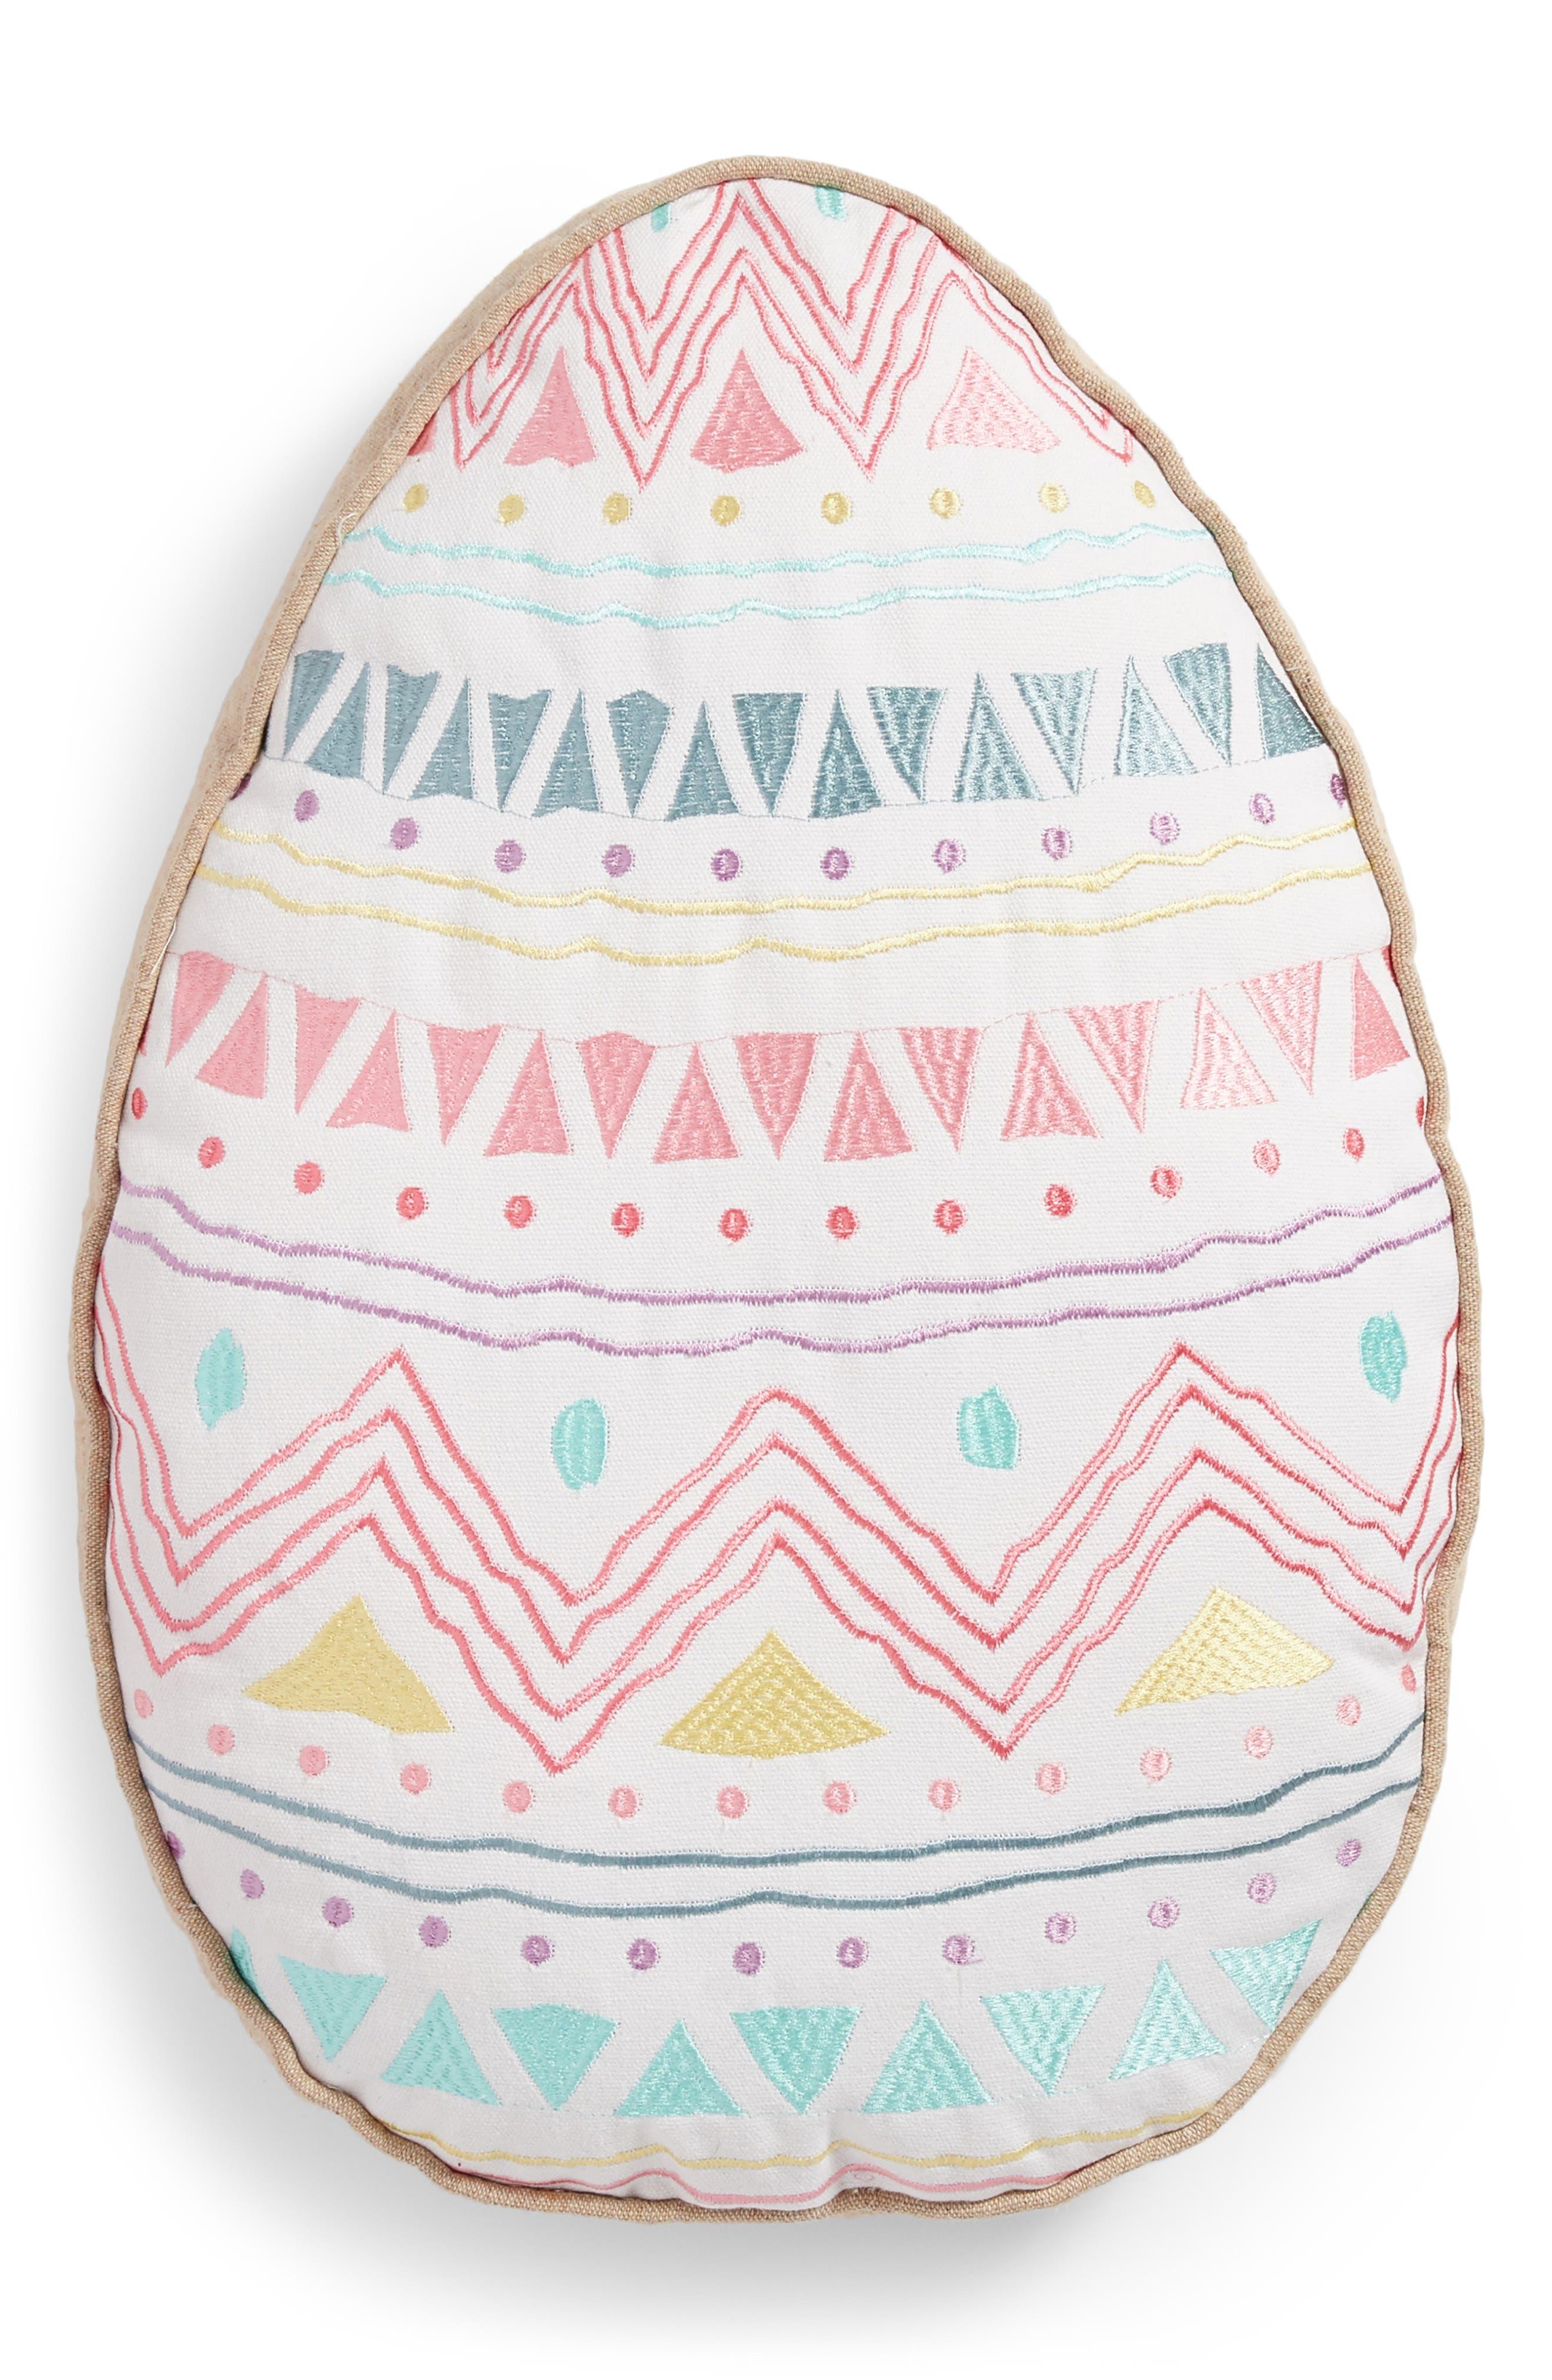 Egg Accent Pillow,                             Main thumbnail 1, color,                             White